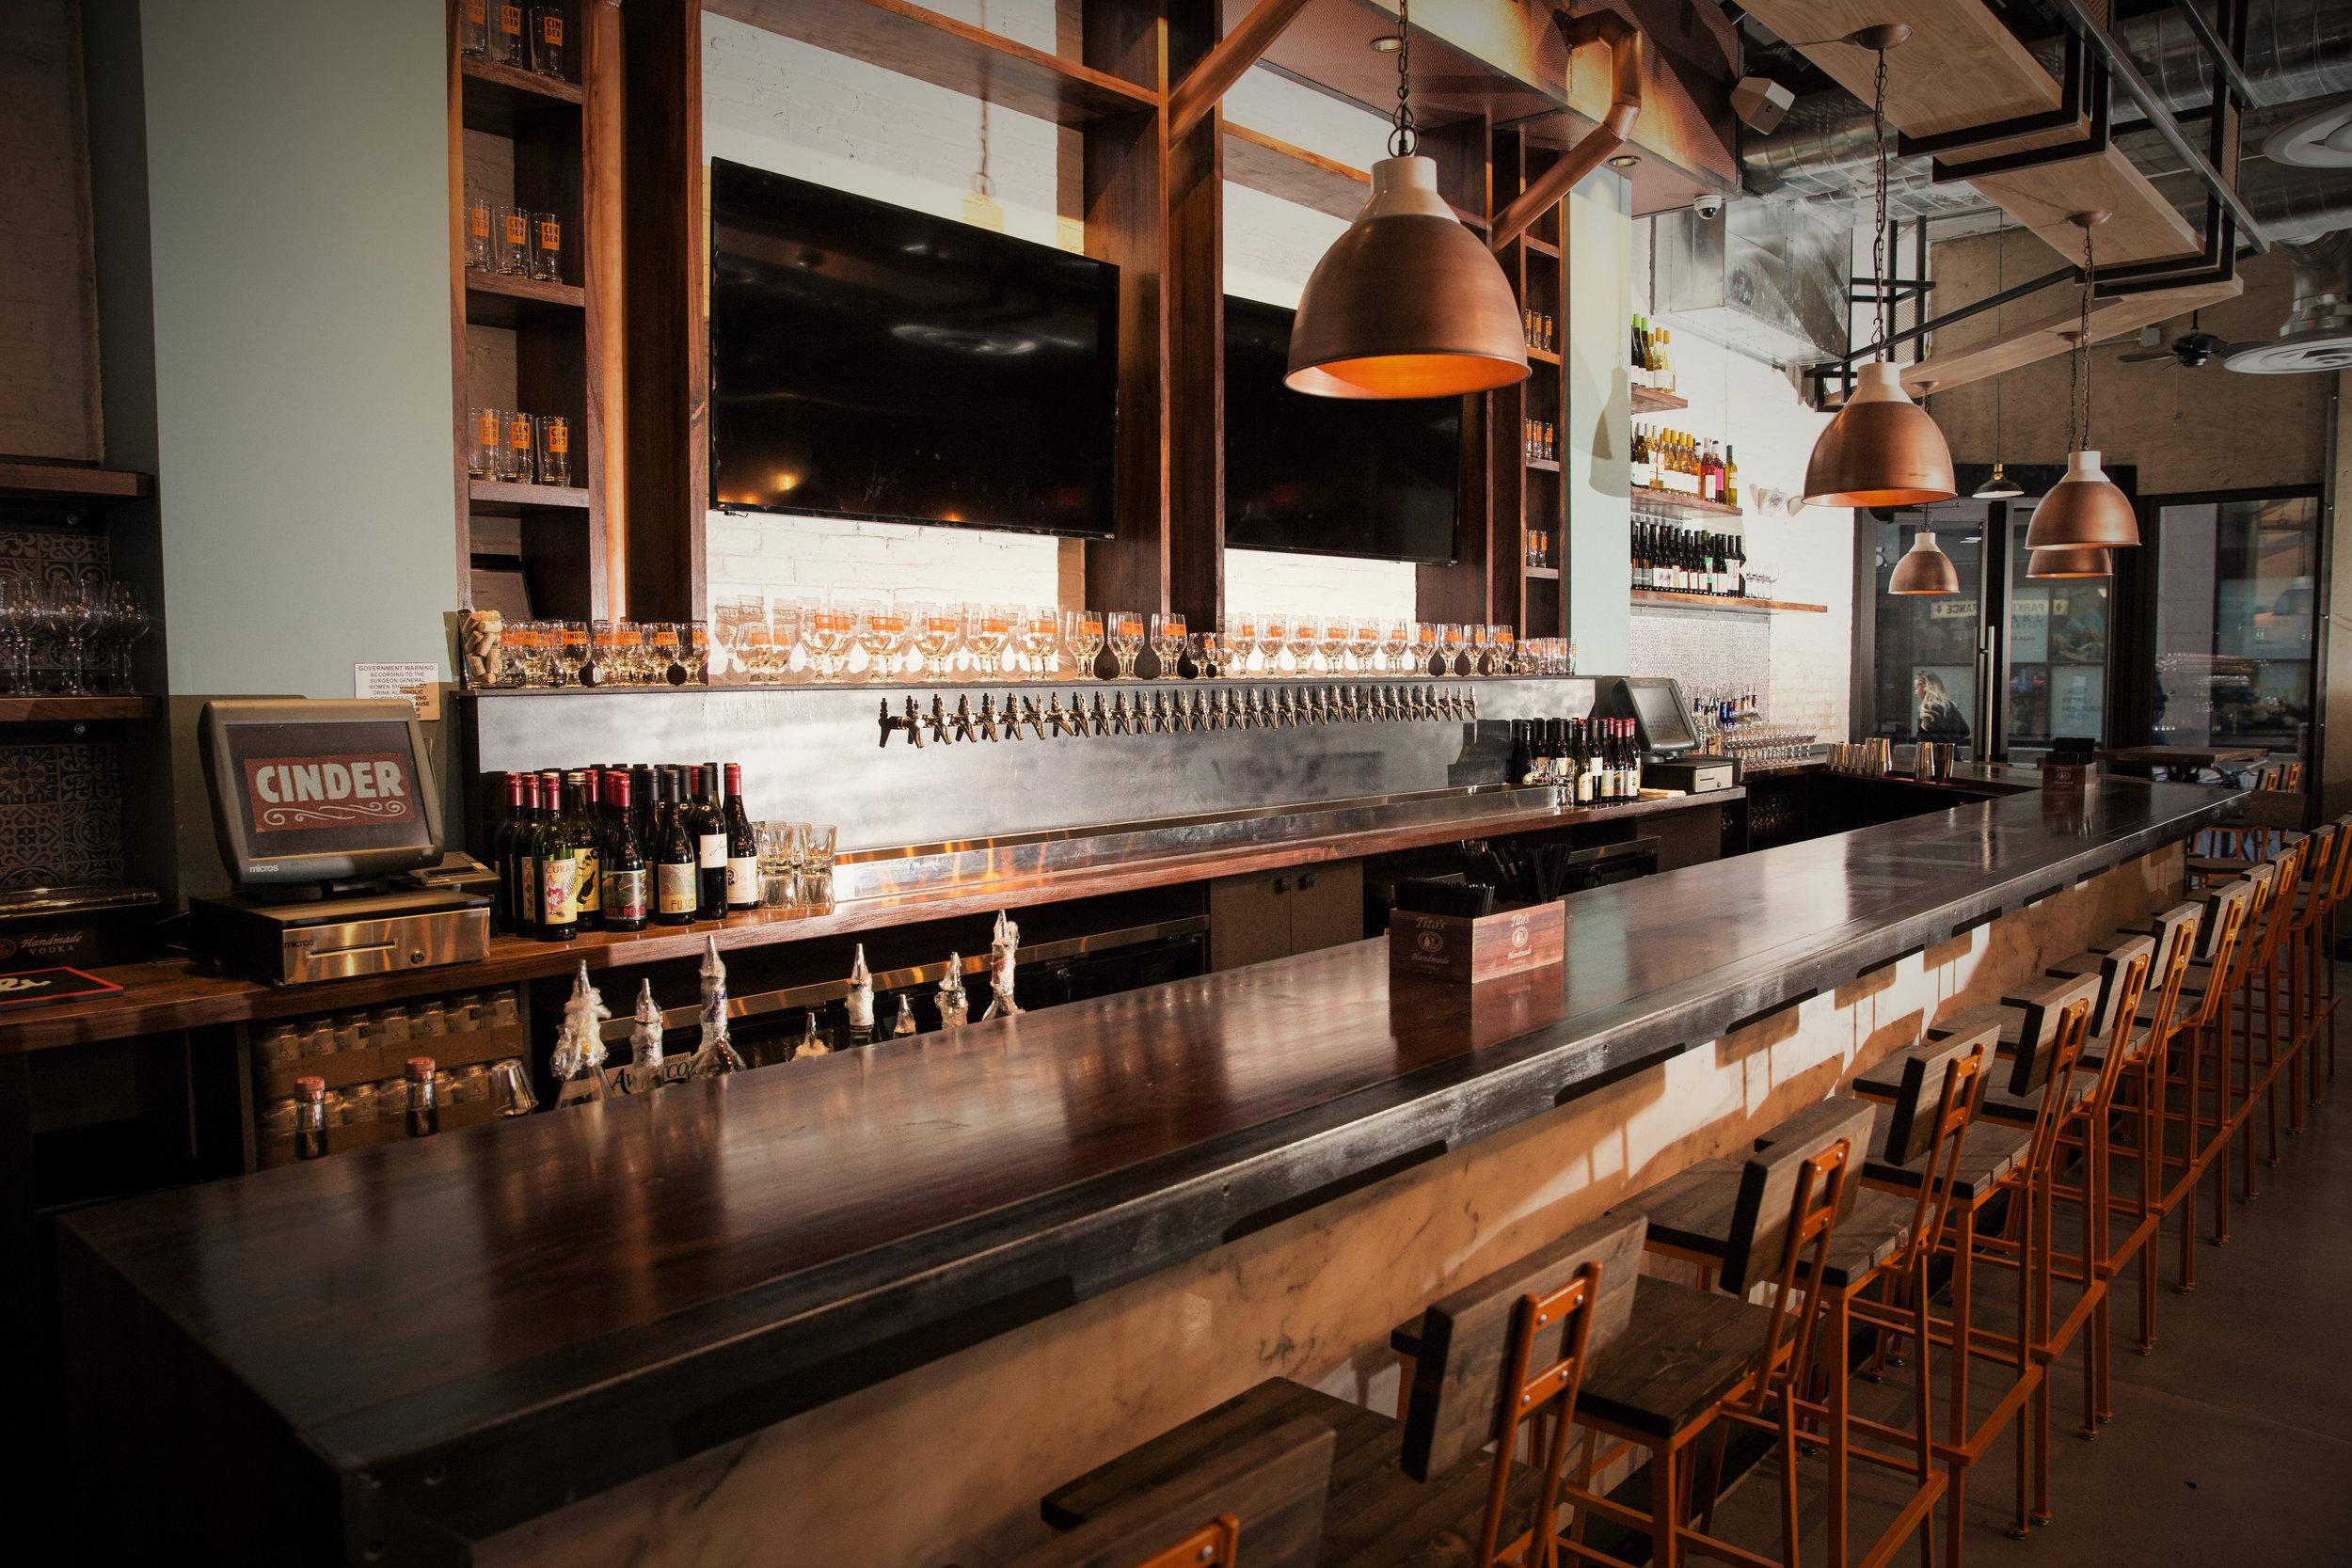 Cinder Bar Interior NYE